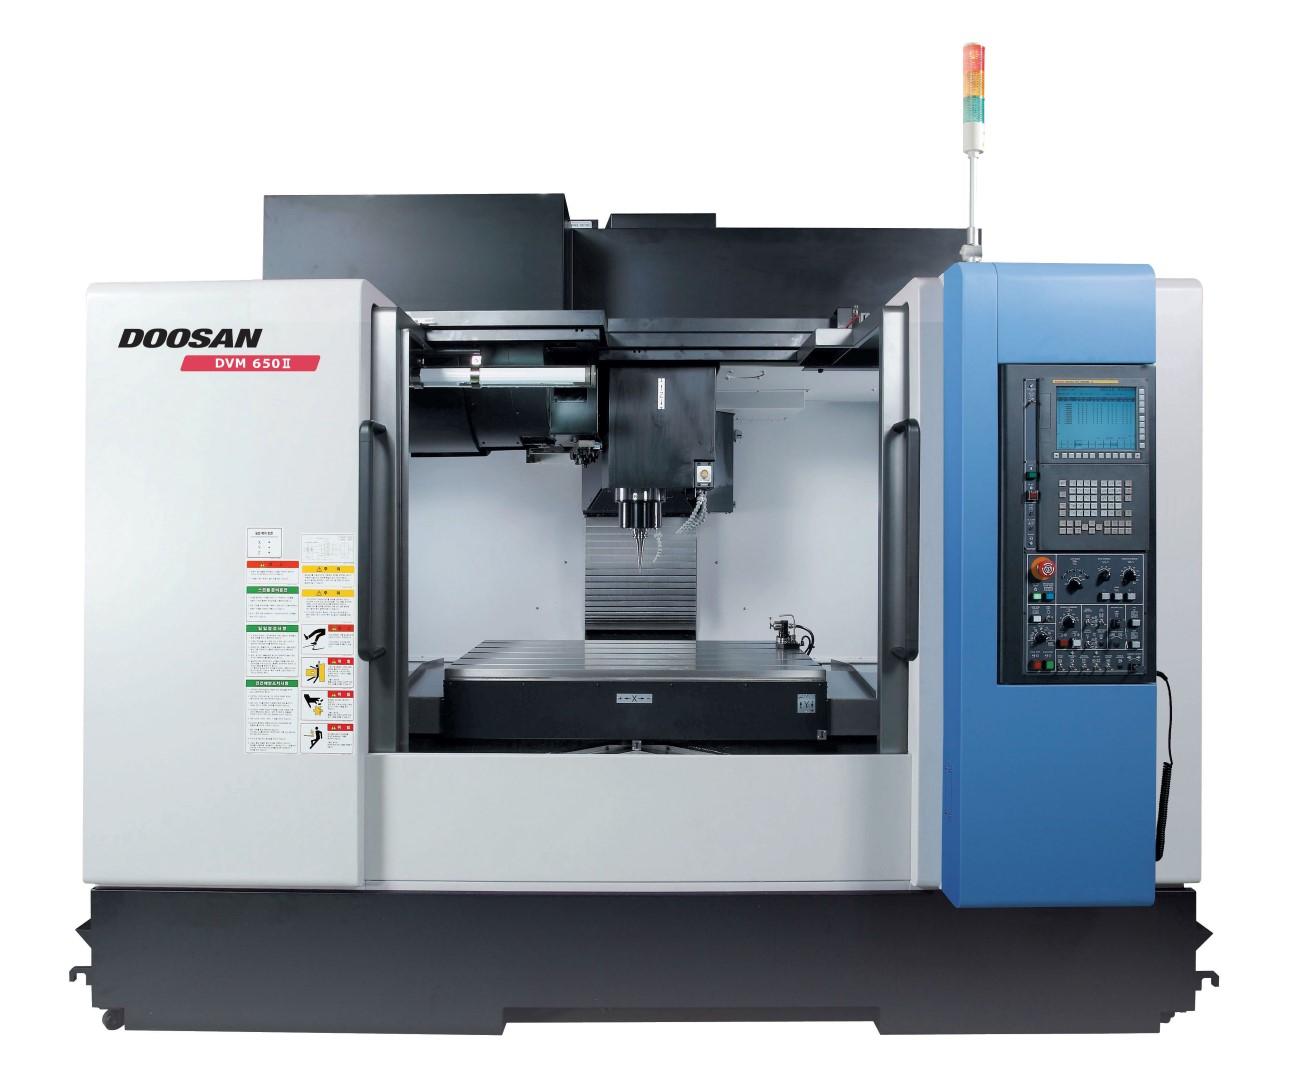 Doosan DVM 500 II, 650 II